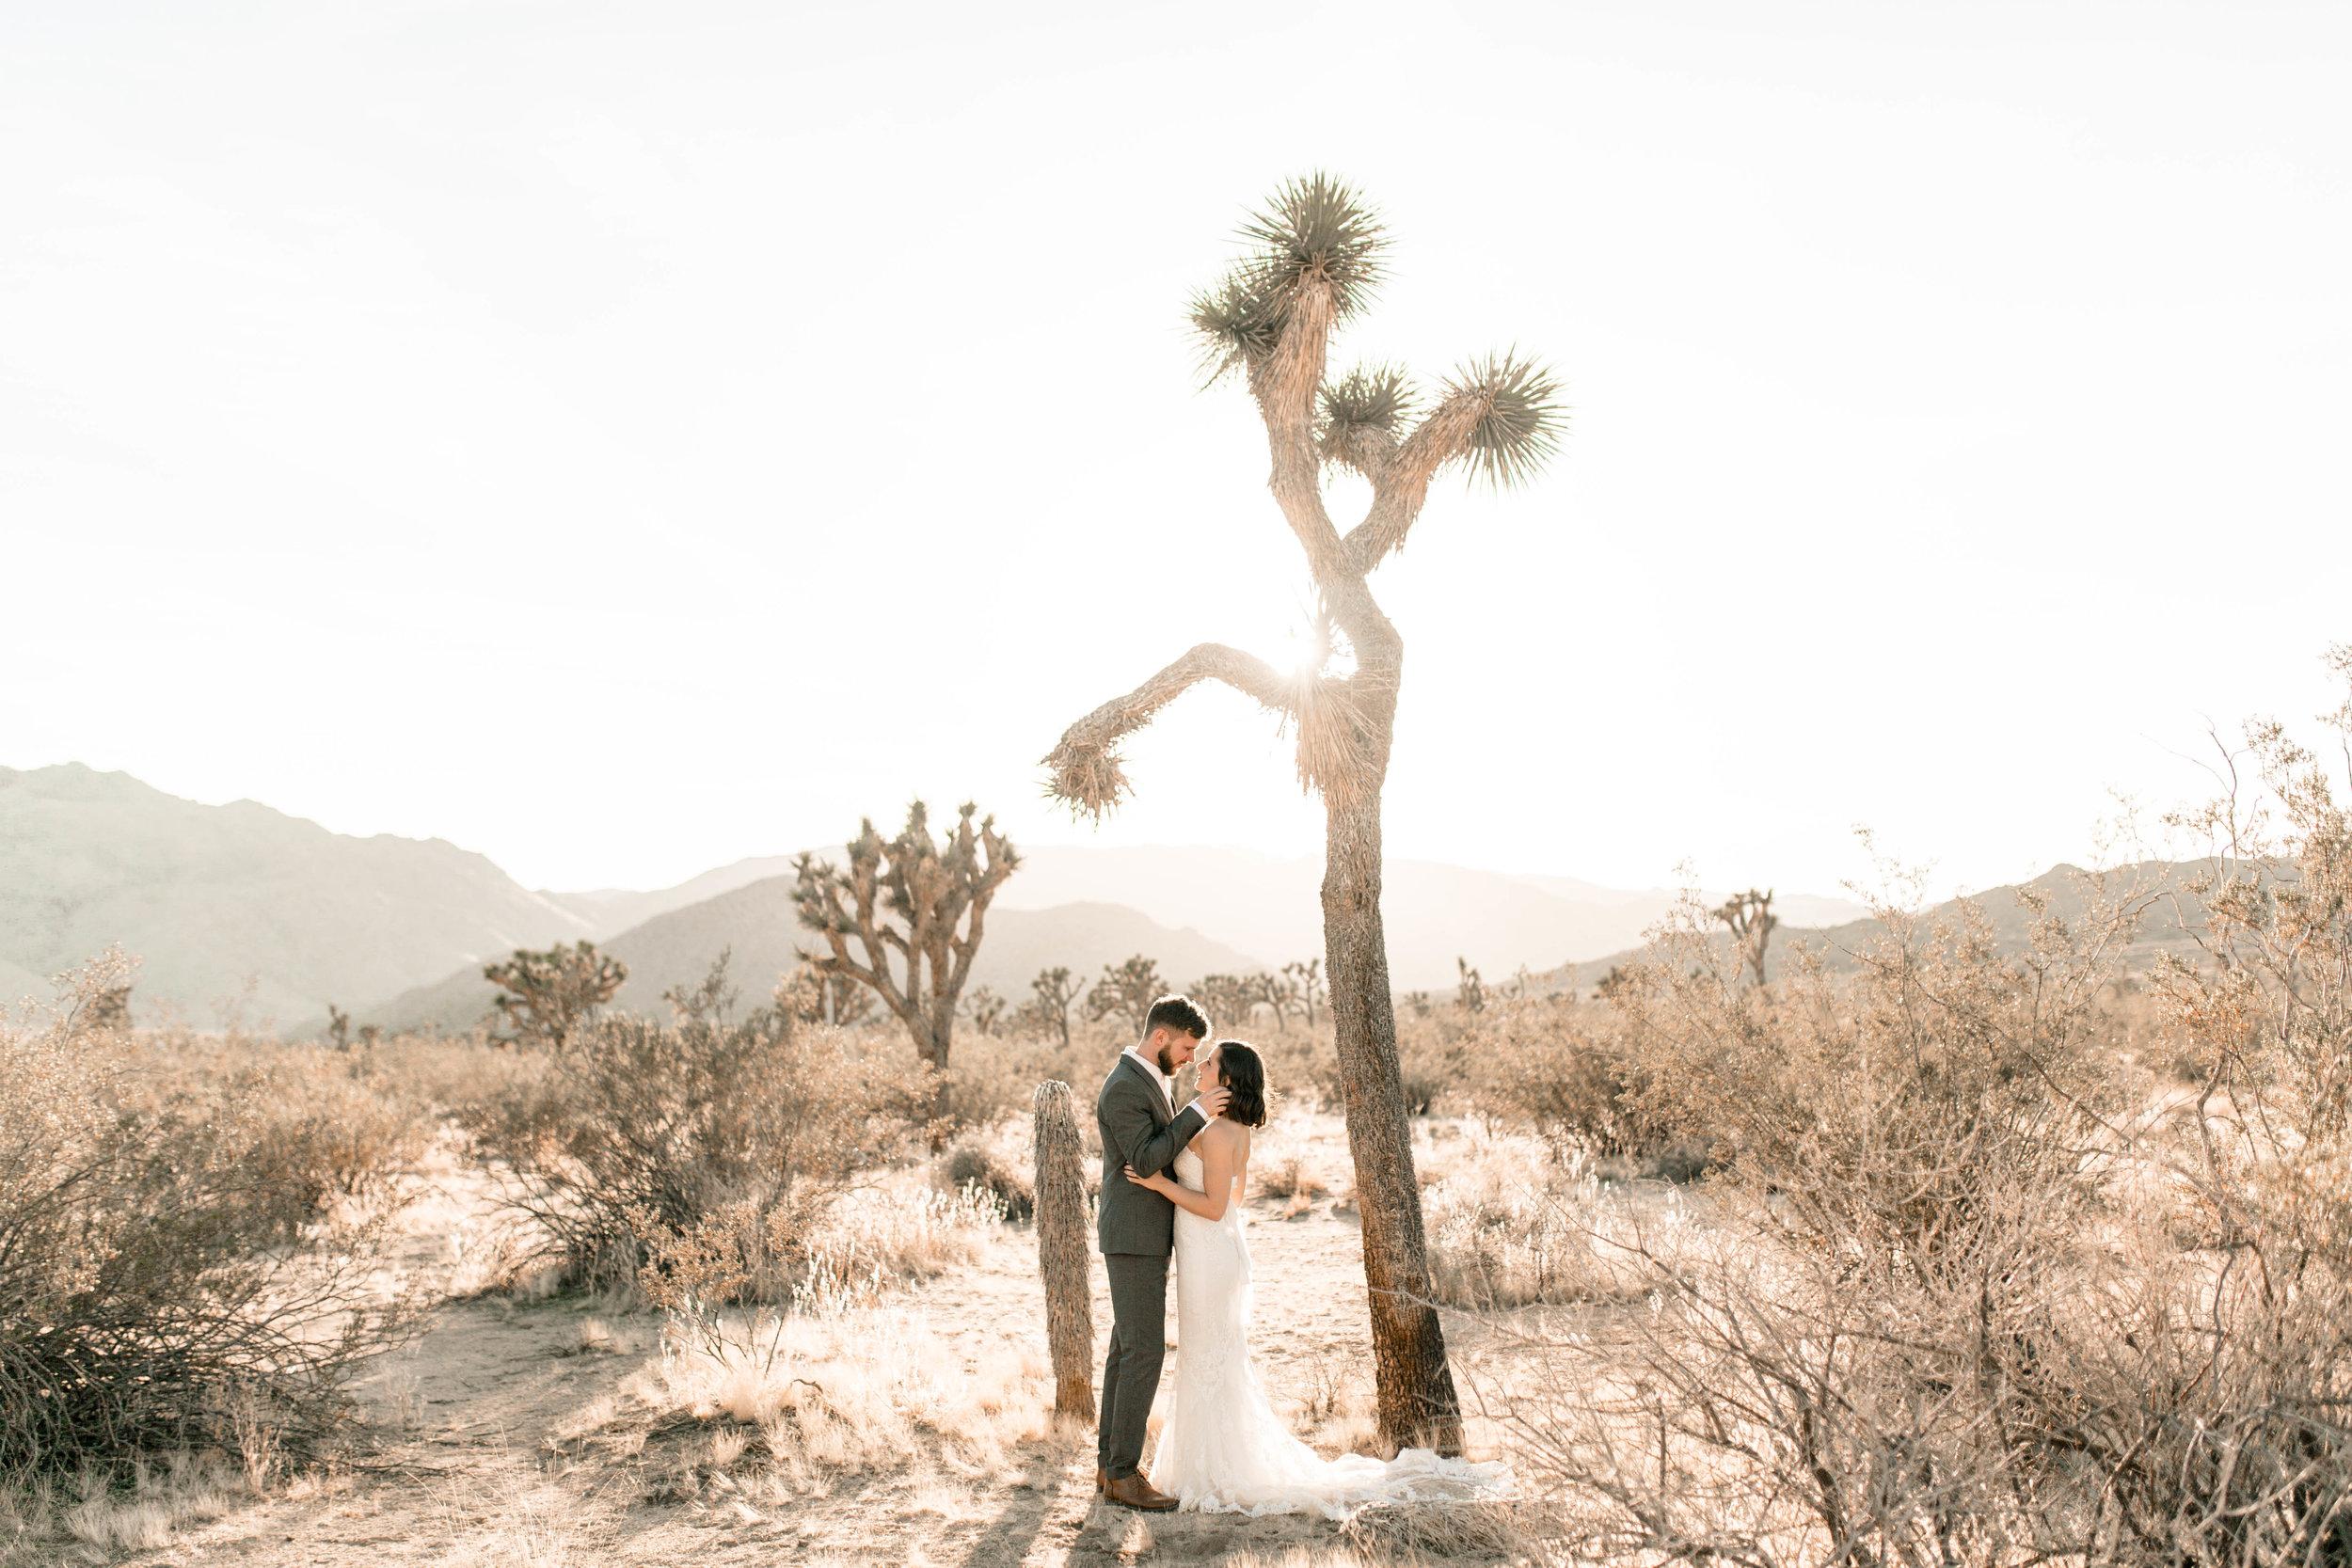 nicole-daacke-photography-joshua-tree-adventurous-elopement-wedding-national-park-wedding-photographer-adventure-wedding-adventurous-elopement-jtree-joshua-tree-national-park-wedding-photographer-intimate-weddings-golden-desert-love-1.jpg